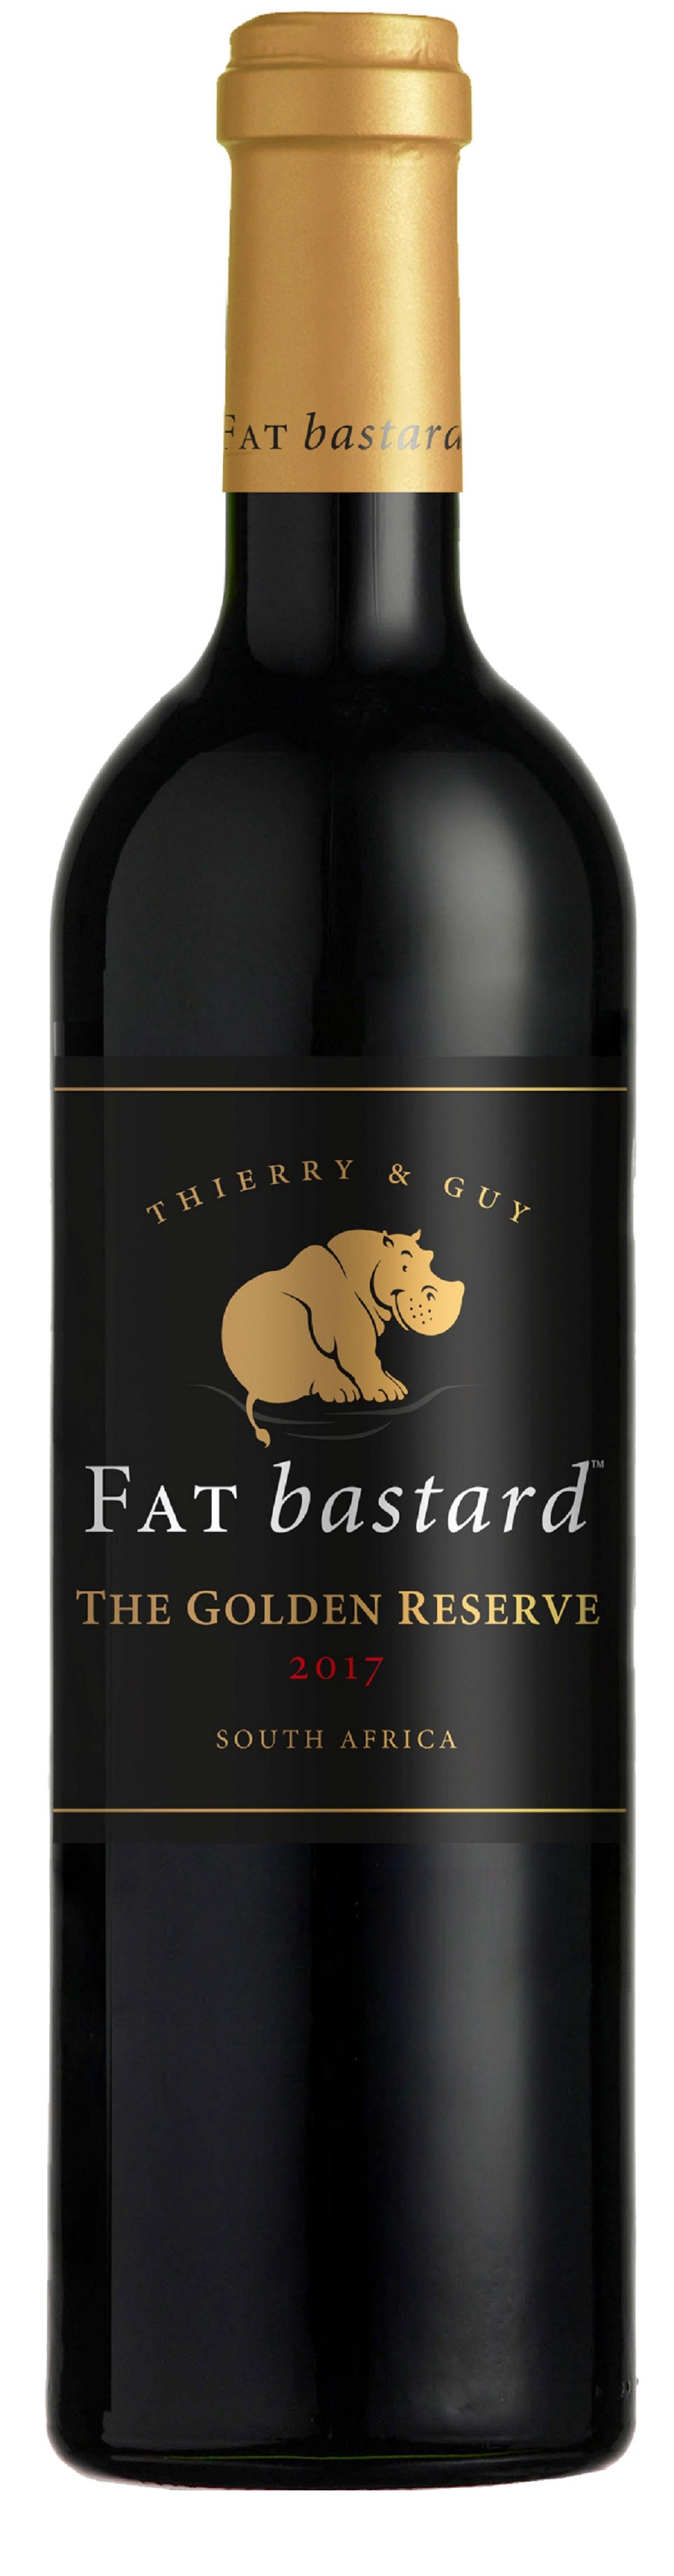 WIN a luxurious box with Fat Bastard Golden Reserve 2017